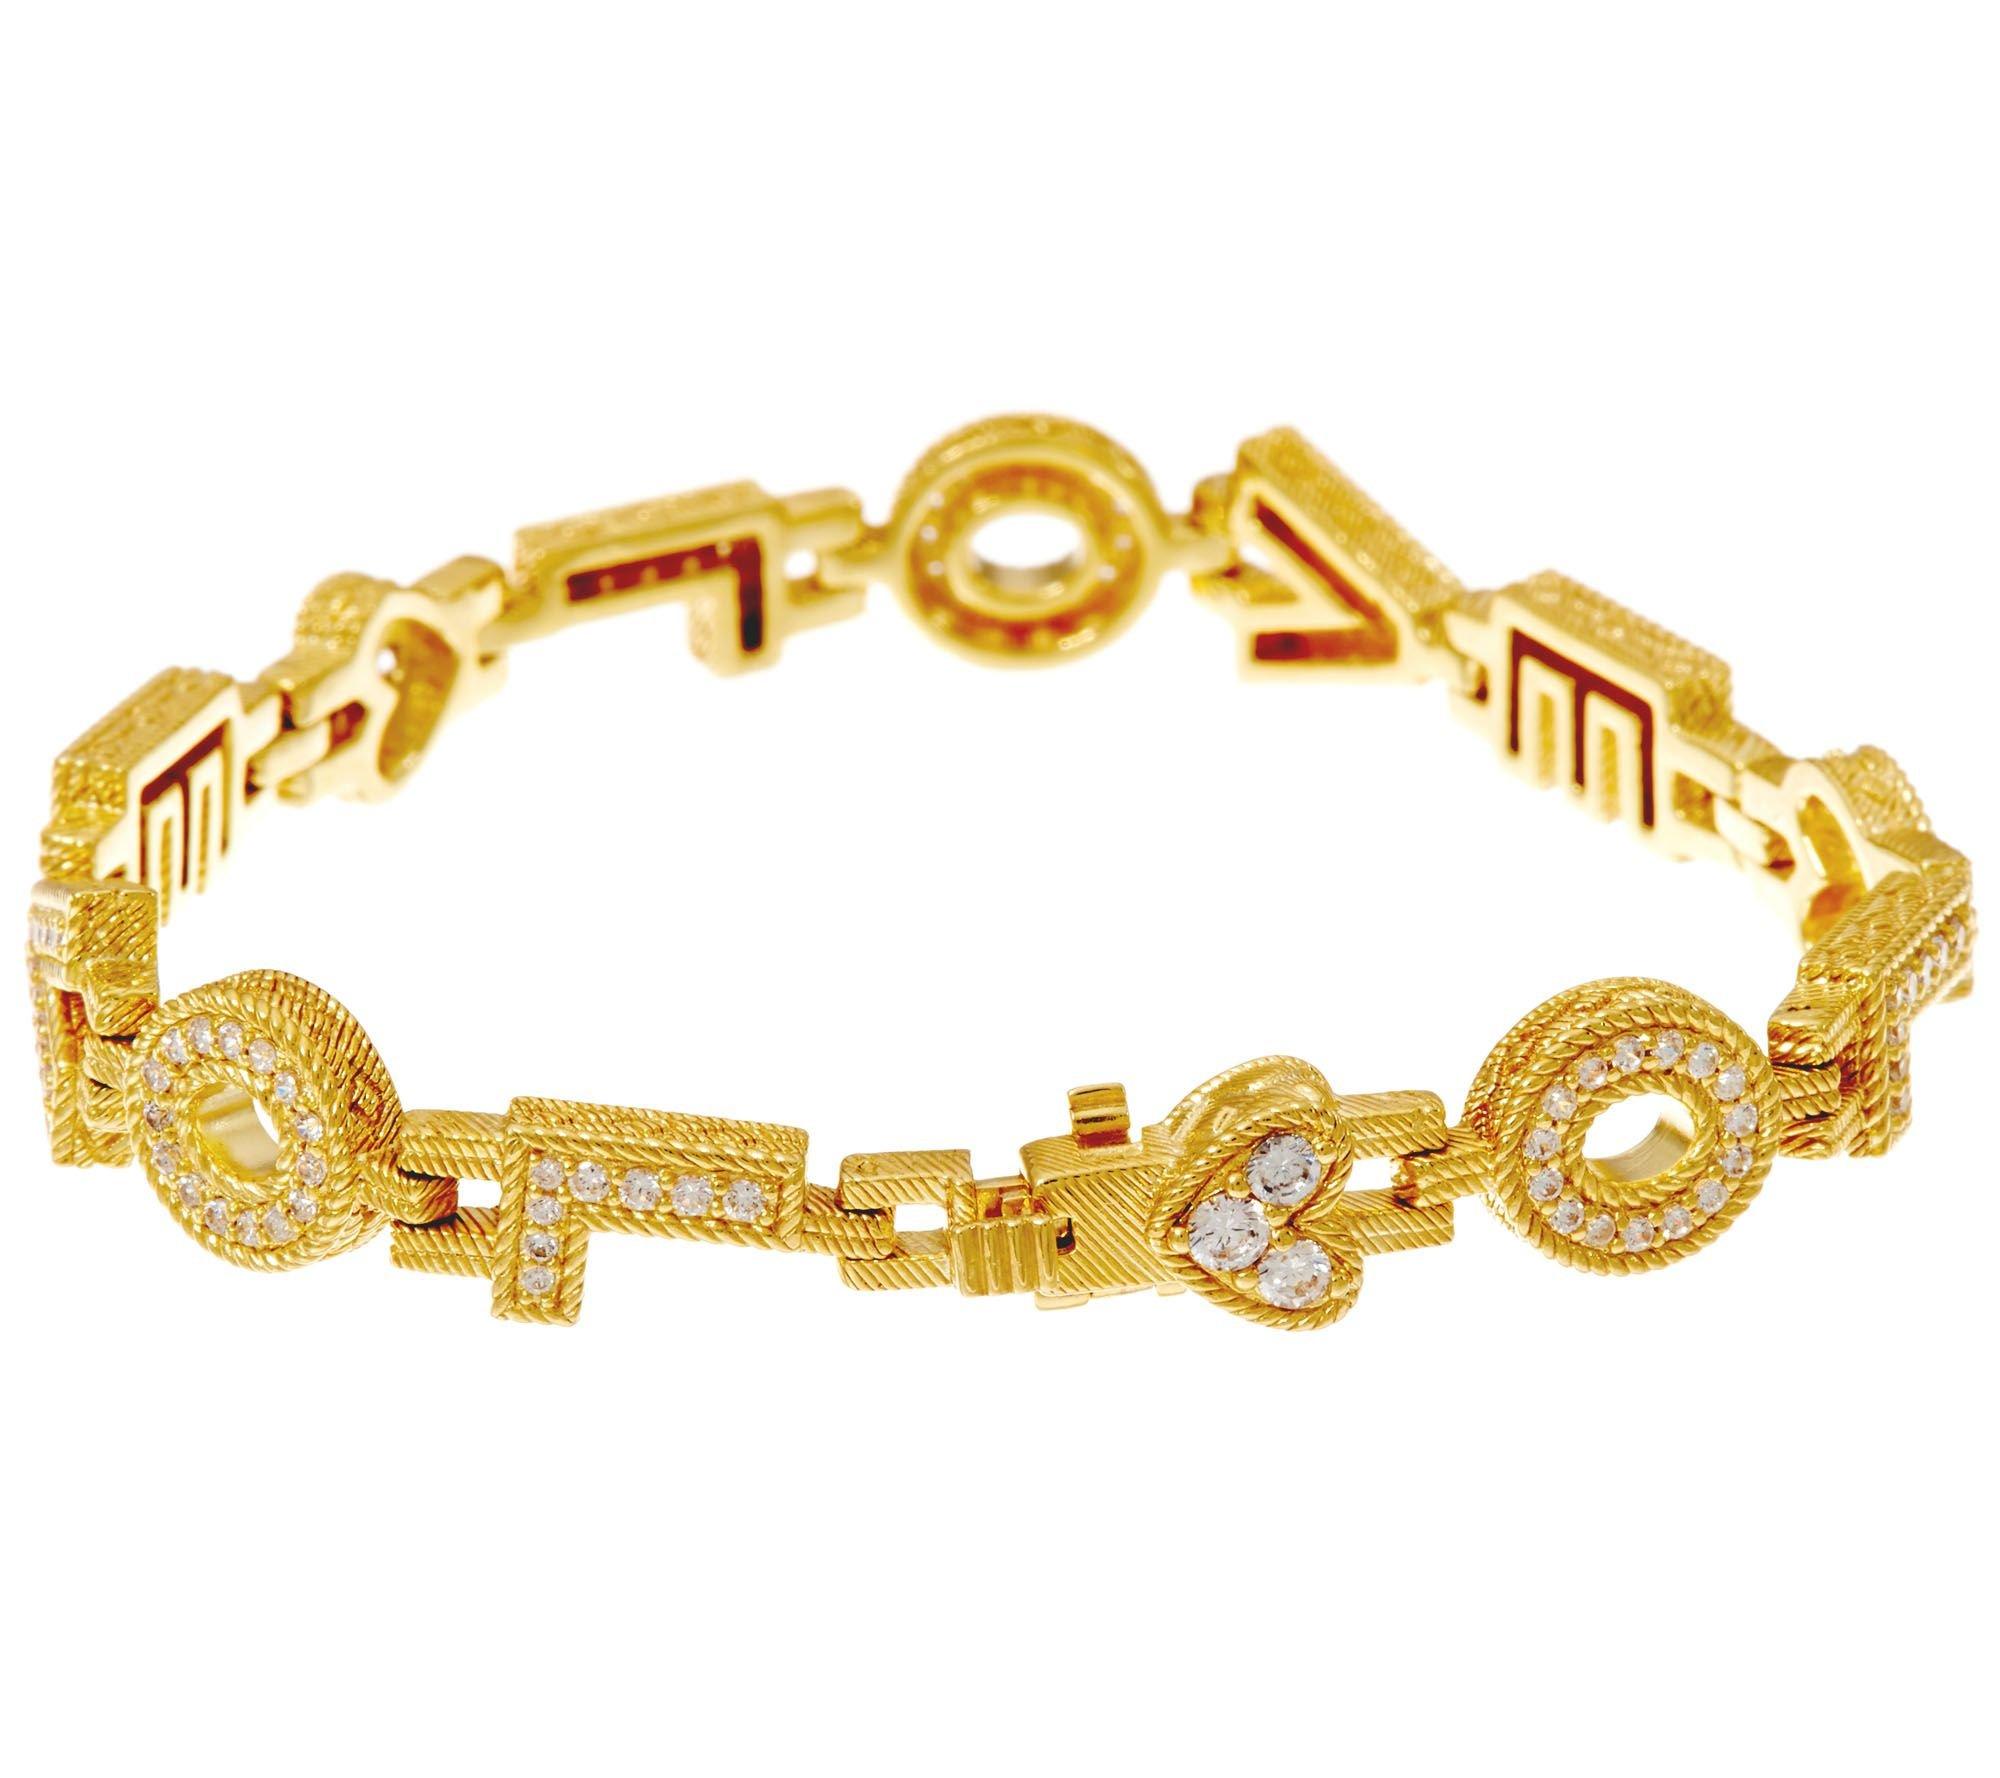 Silvernshine Jewels 1.70 Carat D/VVS1 Diamond Love Design Link Bracelet In 14K Yellow Gold Plated